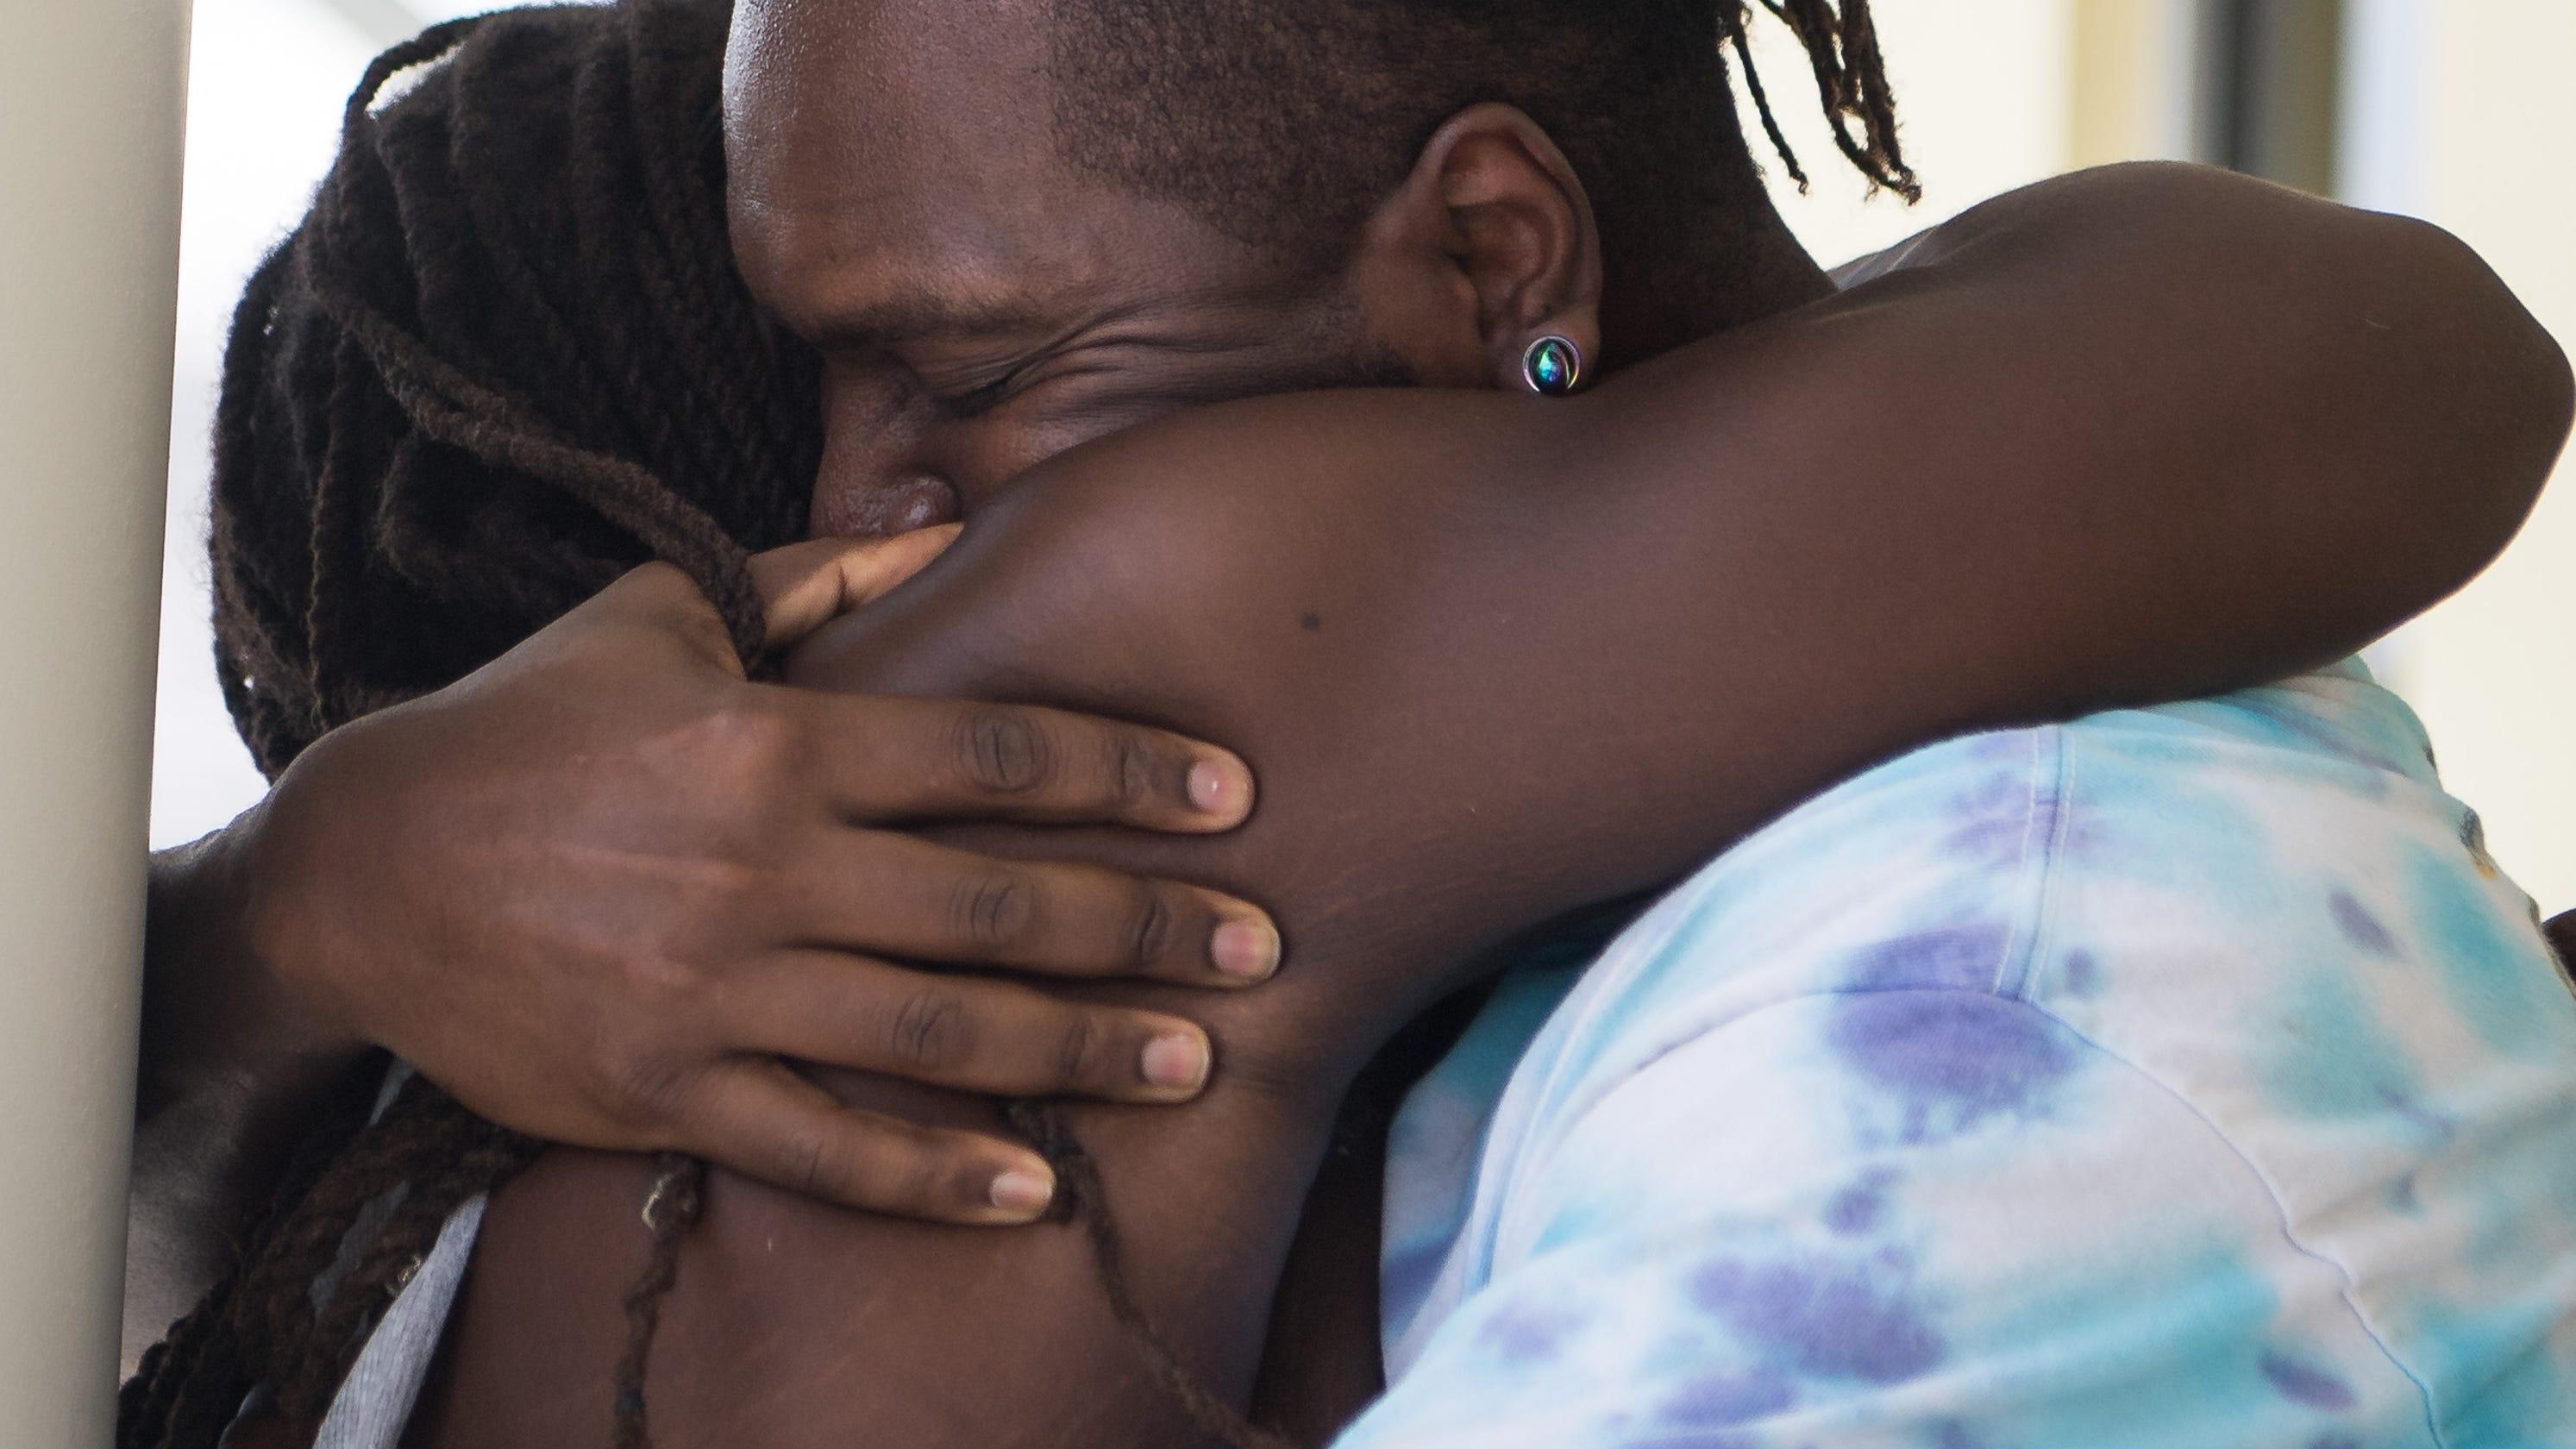 Westlake Legal Group 46e9104a-22ad-4cc2-9054-91449bc34ac9-20190906MCdorianBahamasEvac02 'I wish I could forget it': Hurricane Dorian washed away survivors' lives in Bahamas